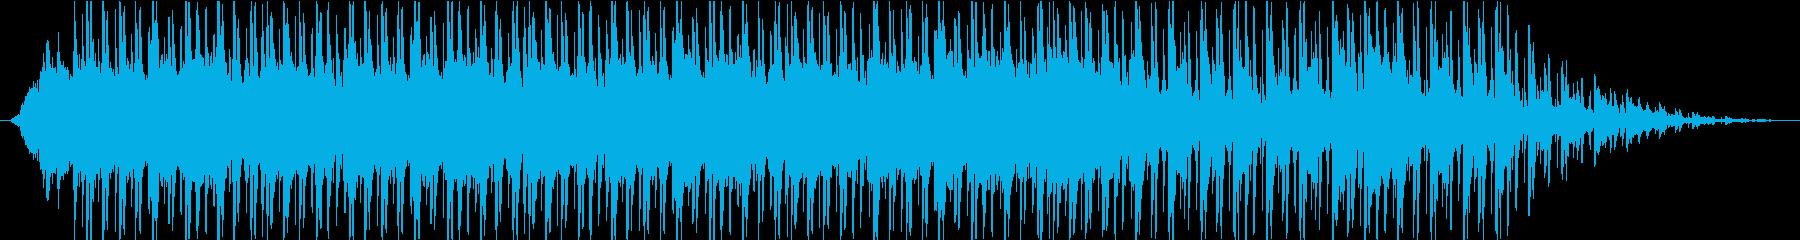 Circle Interludeの再生済みの波形